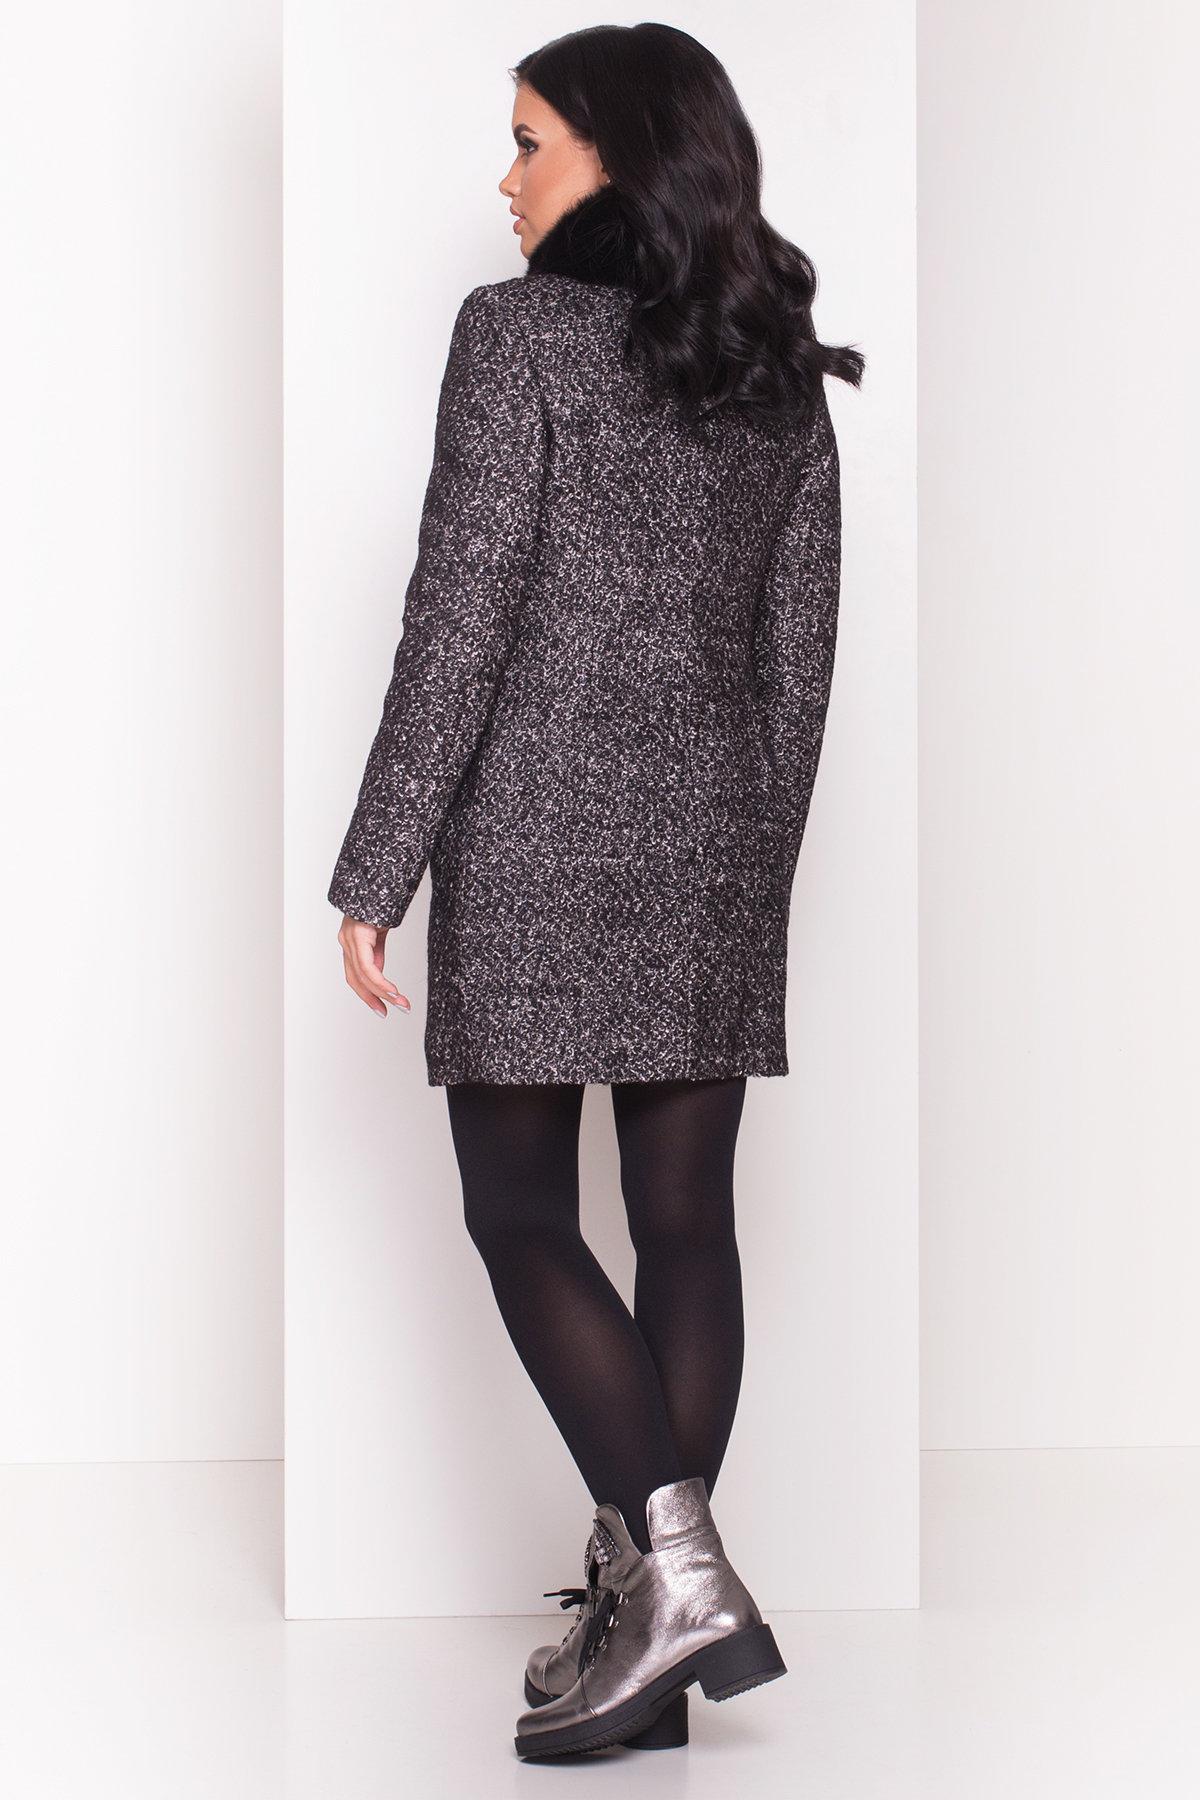 Пальто зима Сан-Ремо 0679 Цвет: Черный / серый 6